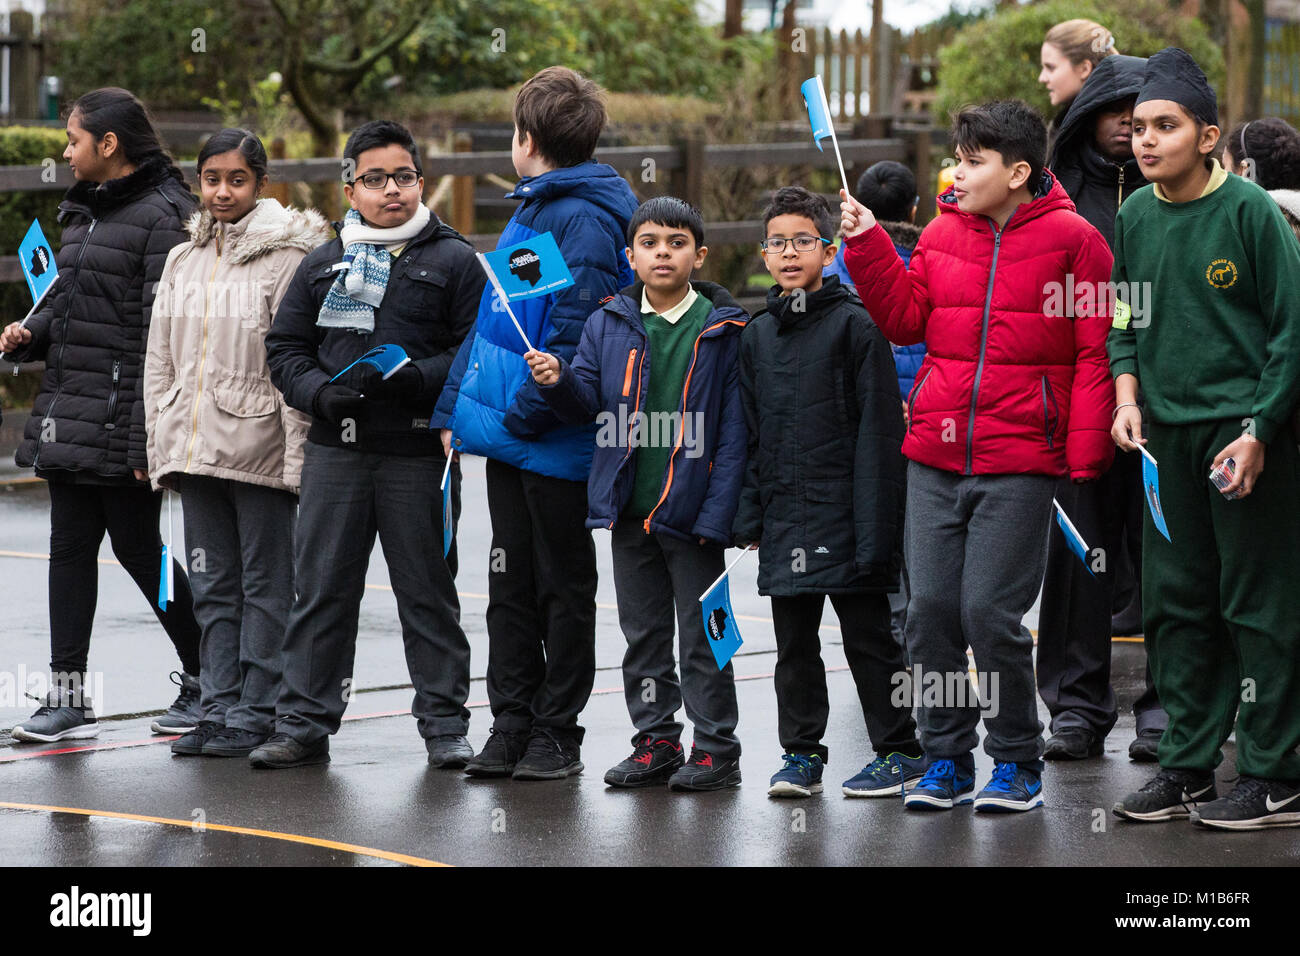 London, UK. 23rd January, 2018. Schoolchildren await the arrival of the Duchess of Cambridge at Roe Green Junior - Stock Image